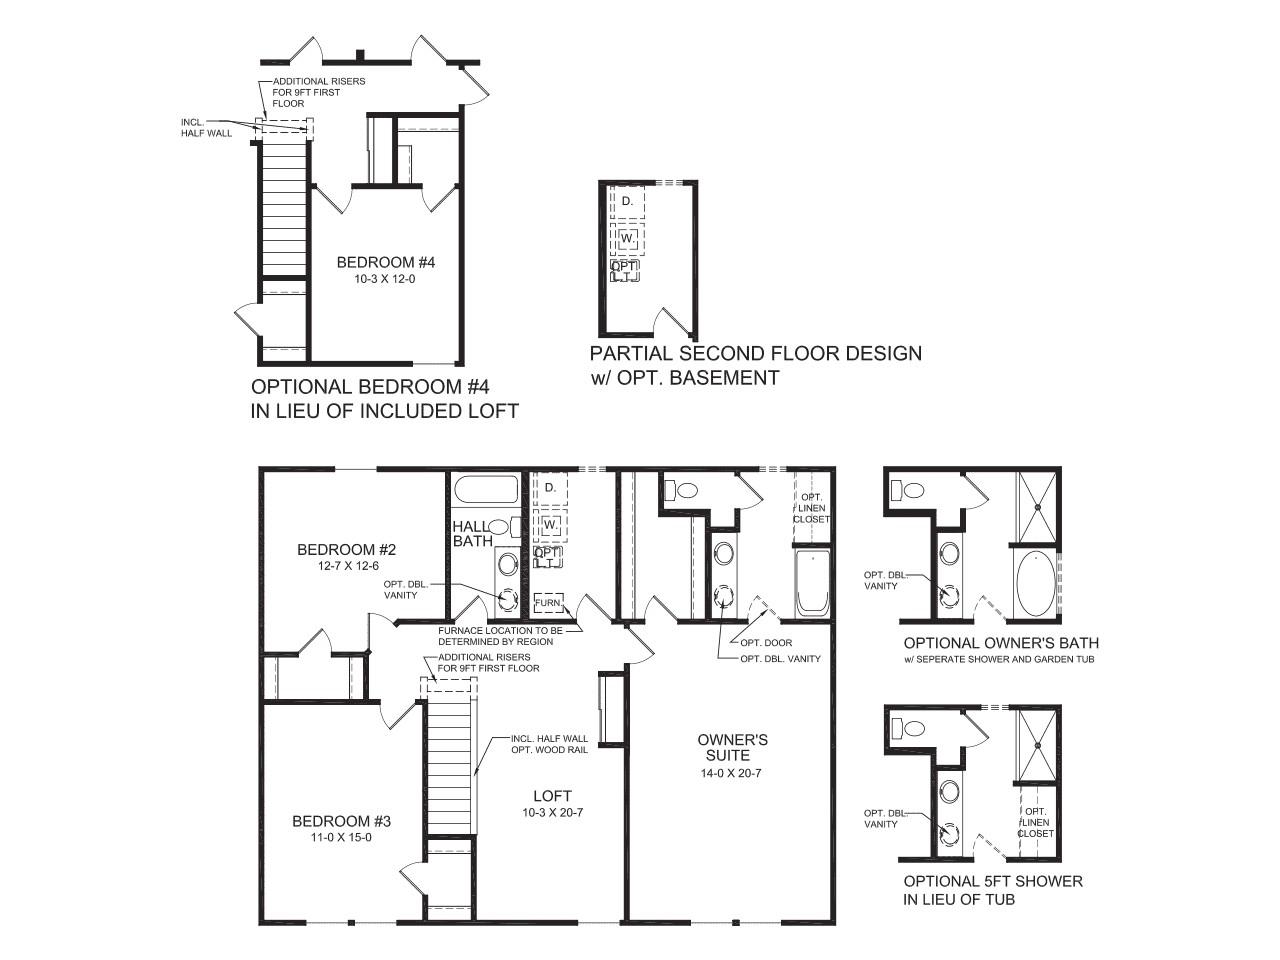 Fischer Homes Yosemite Floor Plan New Single Family Homes atlanta Ga Yosemite Fischer